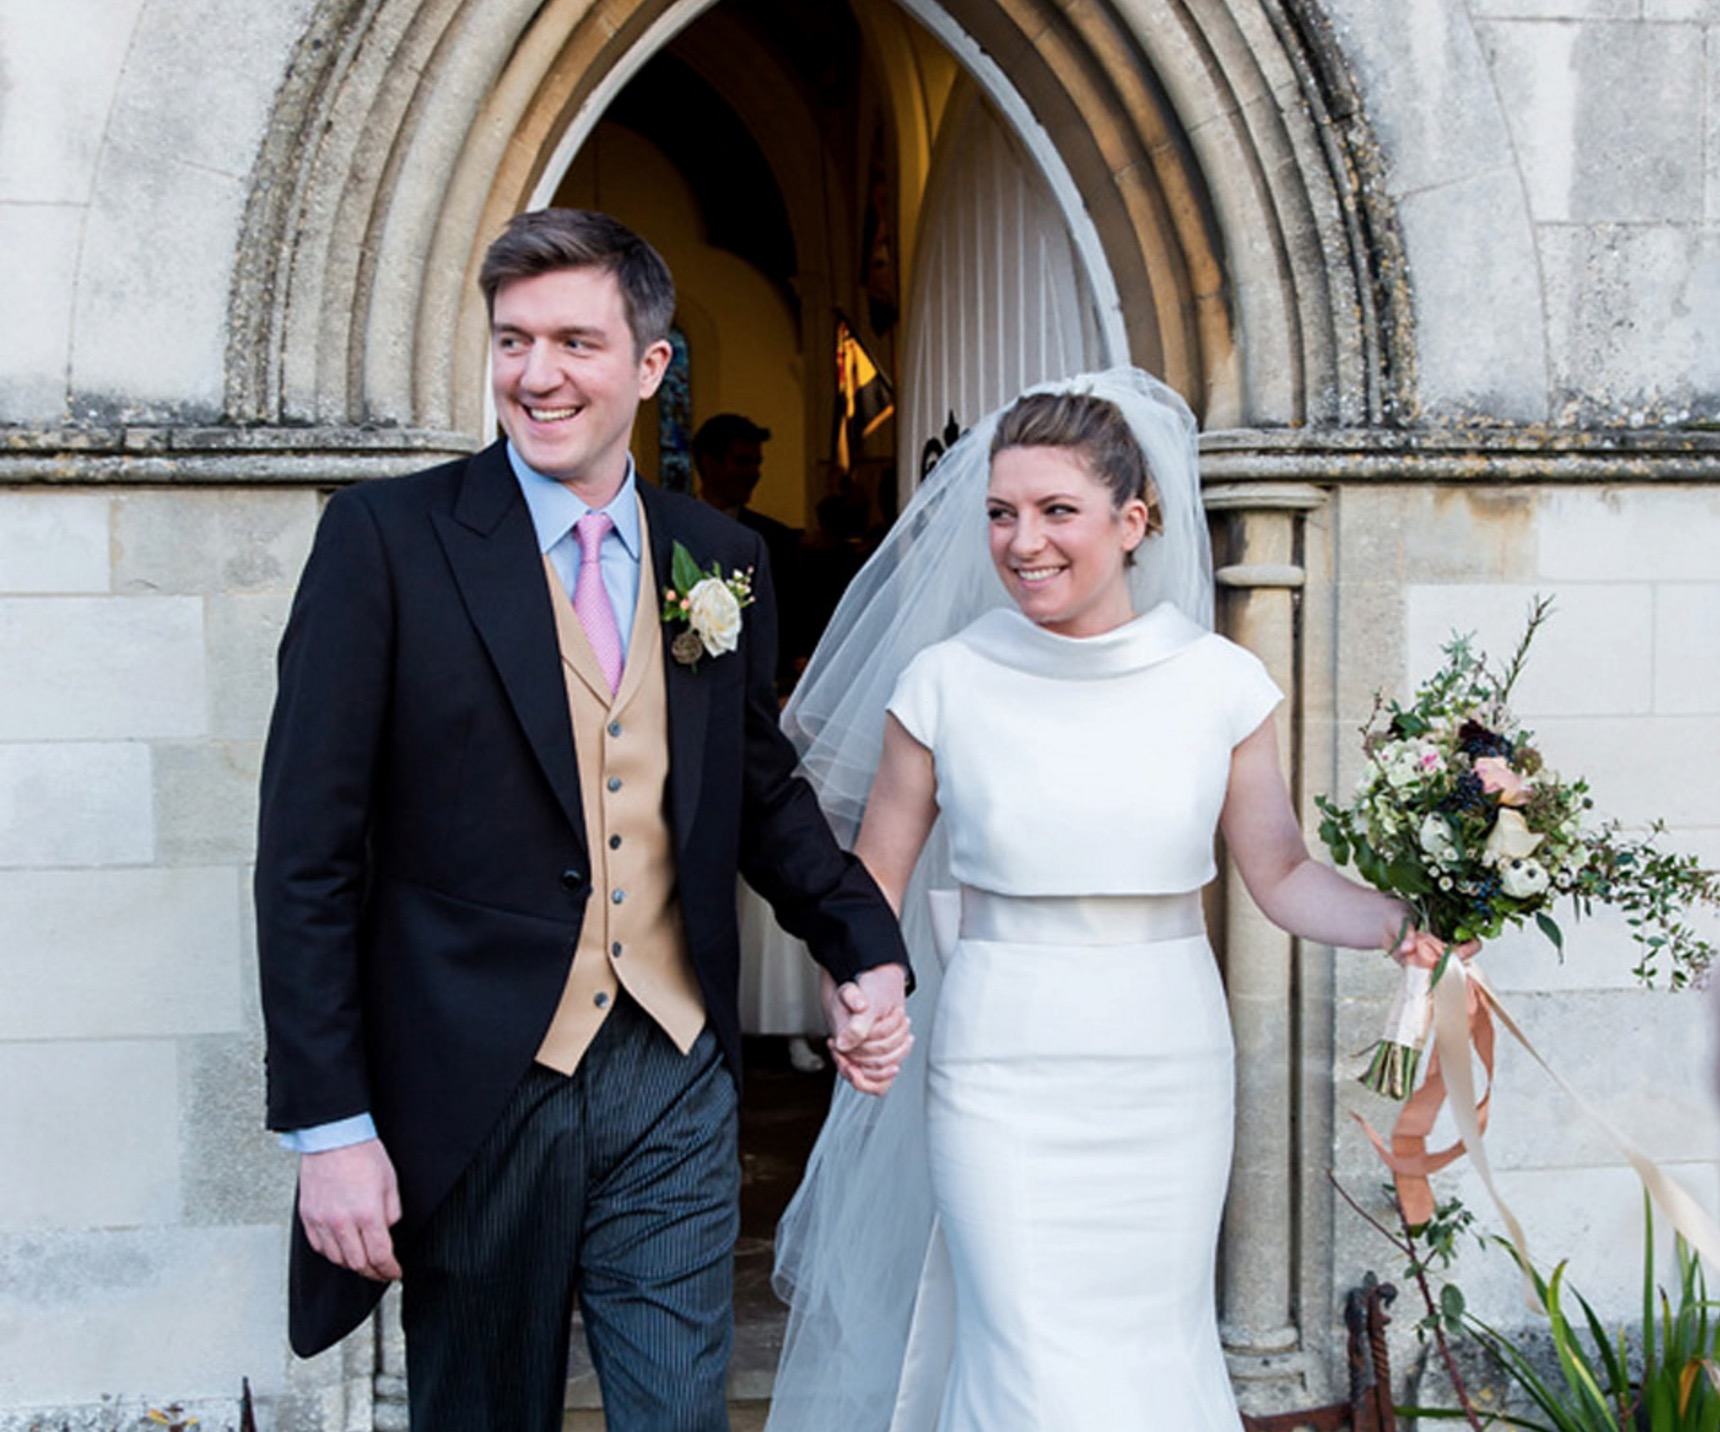 A Modern and Elegant Suzanne Neville Gown for a Winter Wonderland Wedding